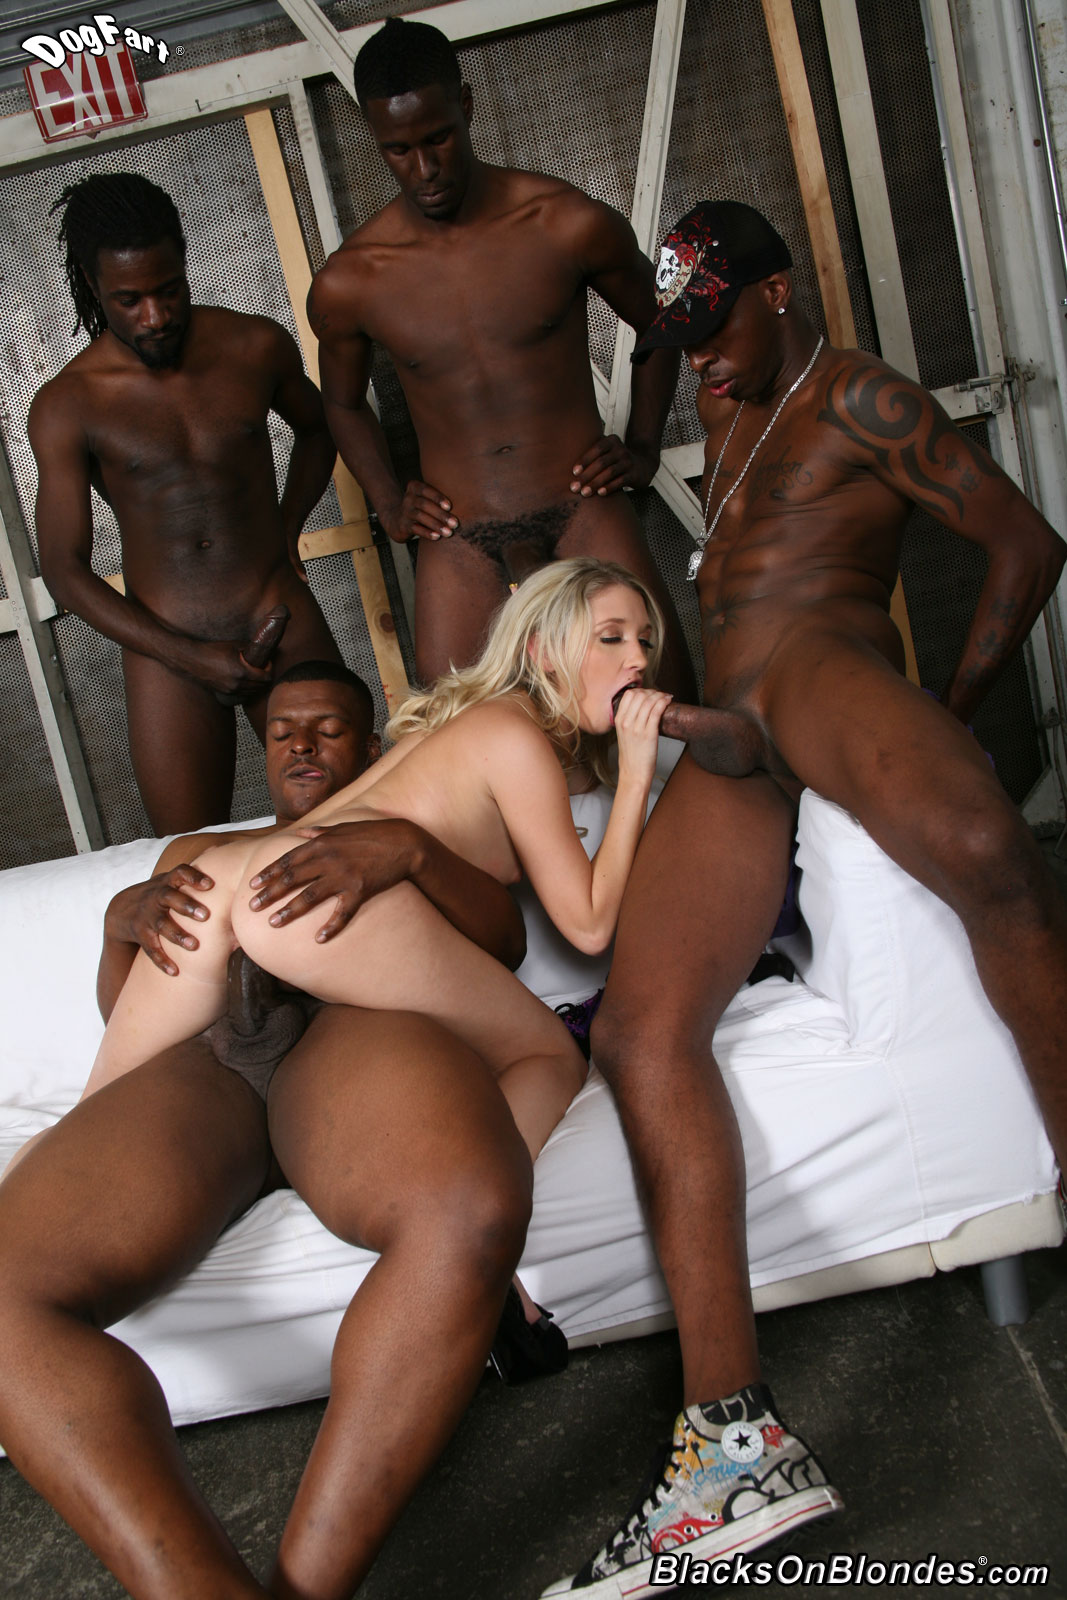 Wife breeding black on blonde cum shots